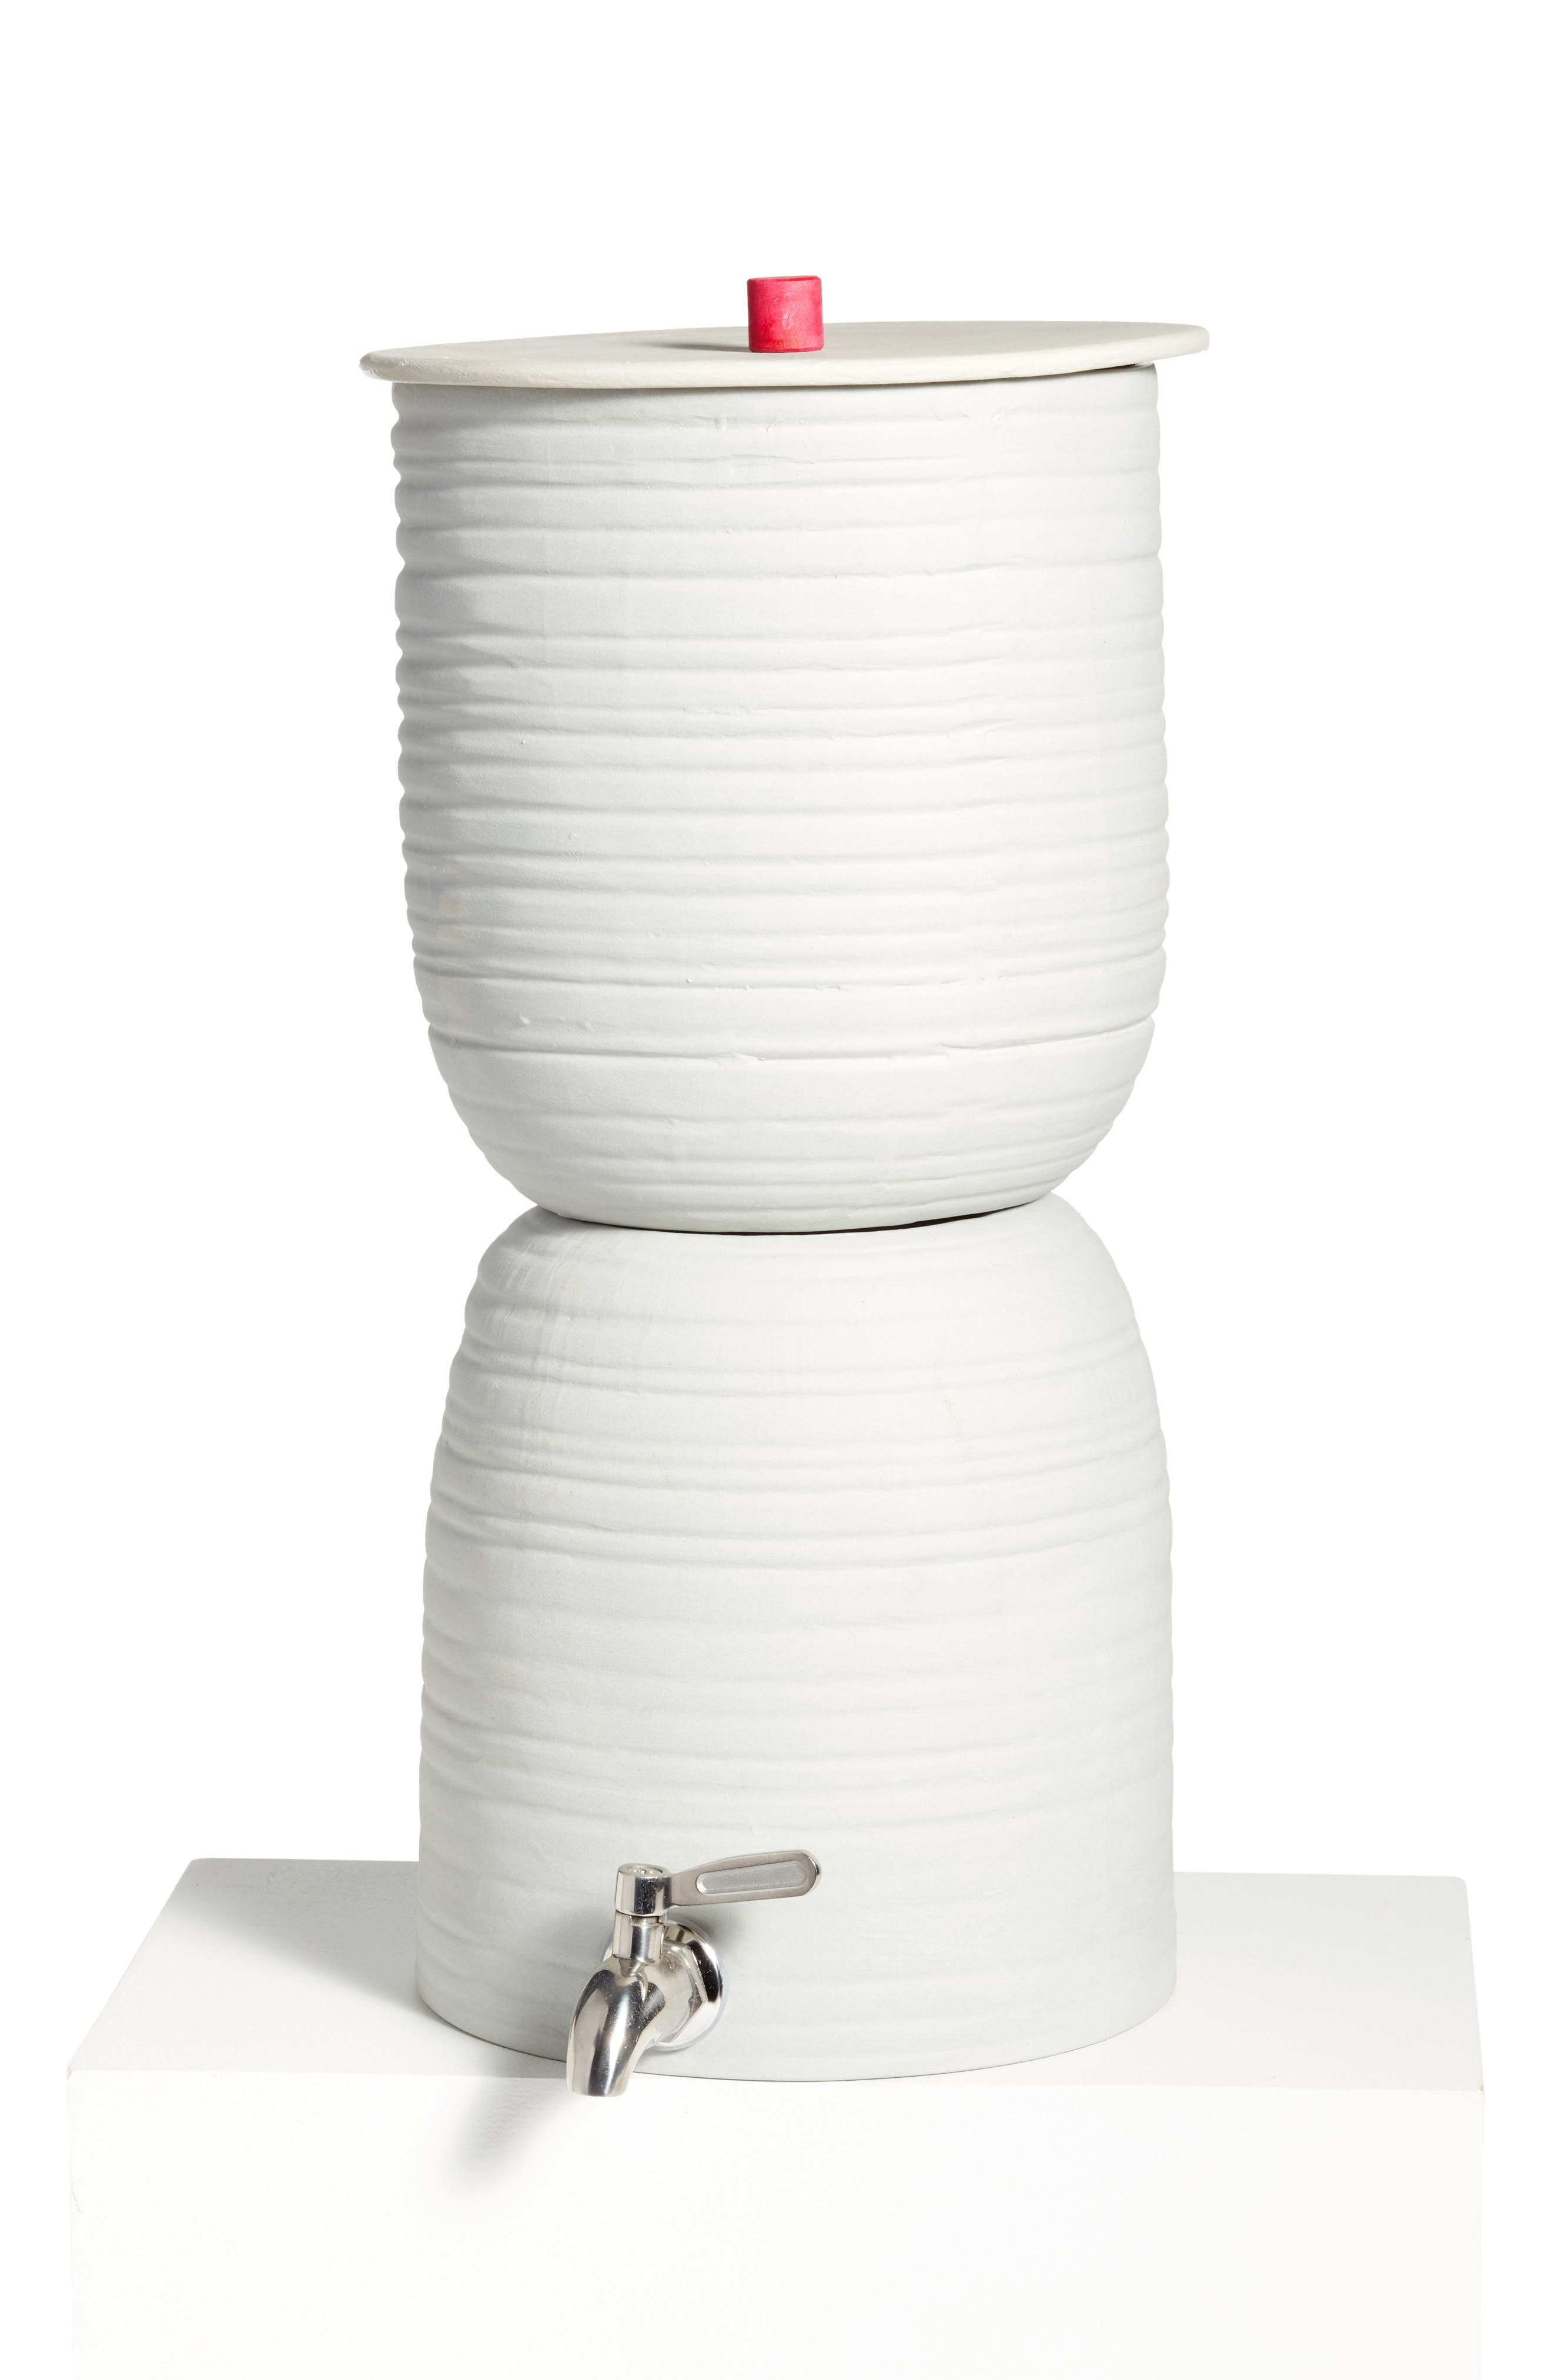 Wavy Porcelain Water Filter,                             Main thumbnail 1, color,                             White